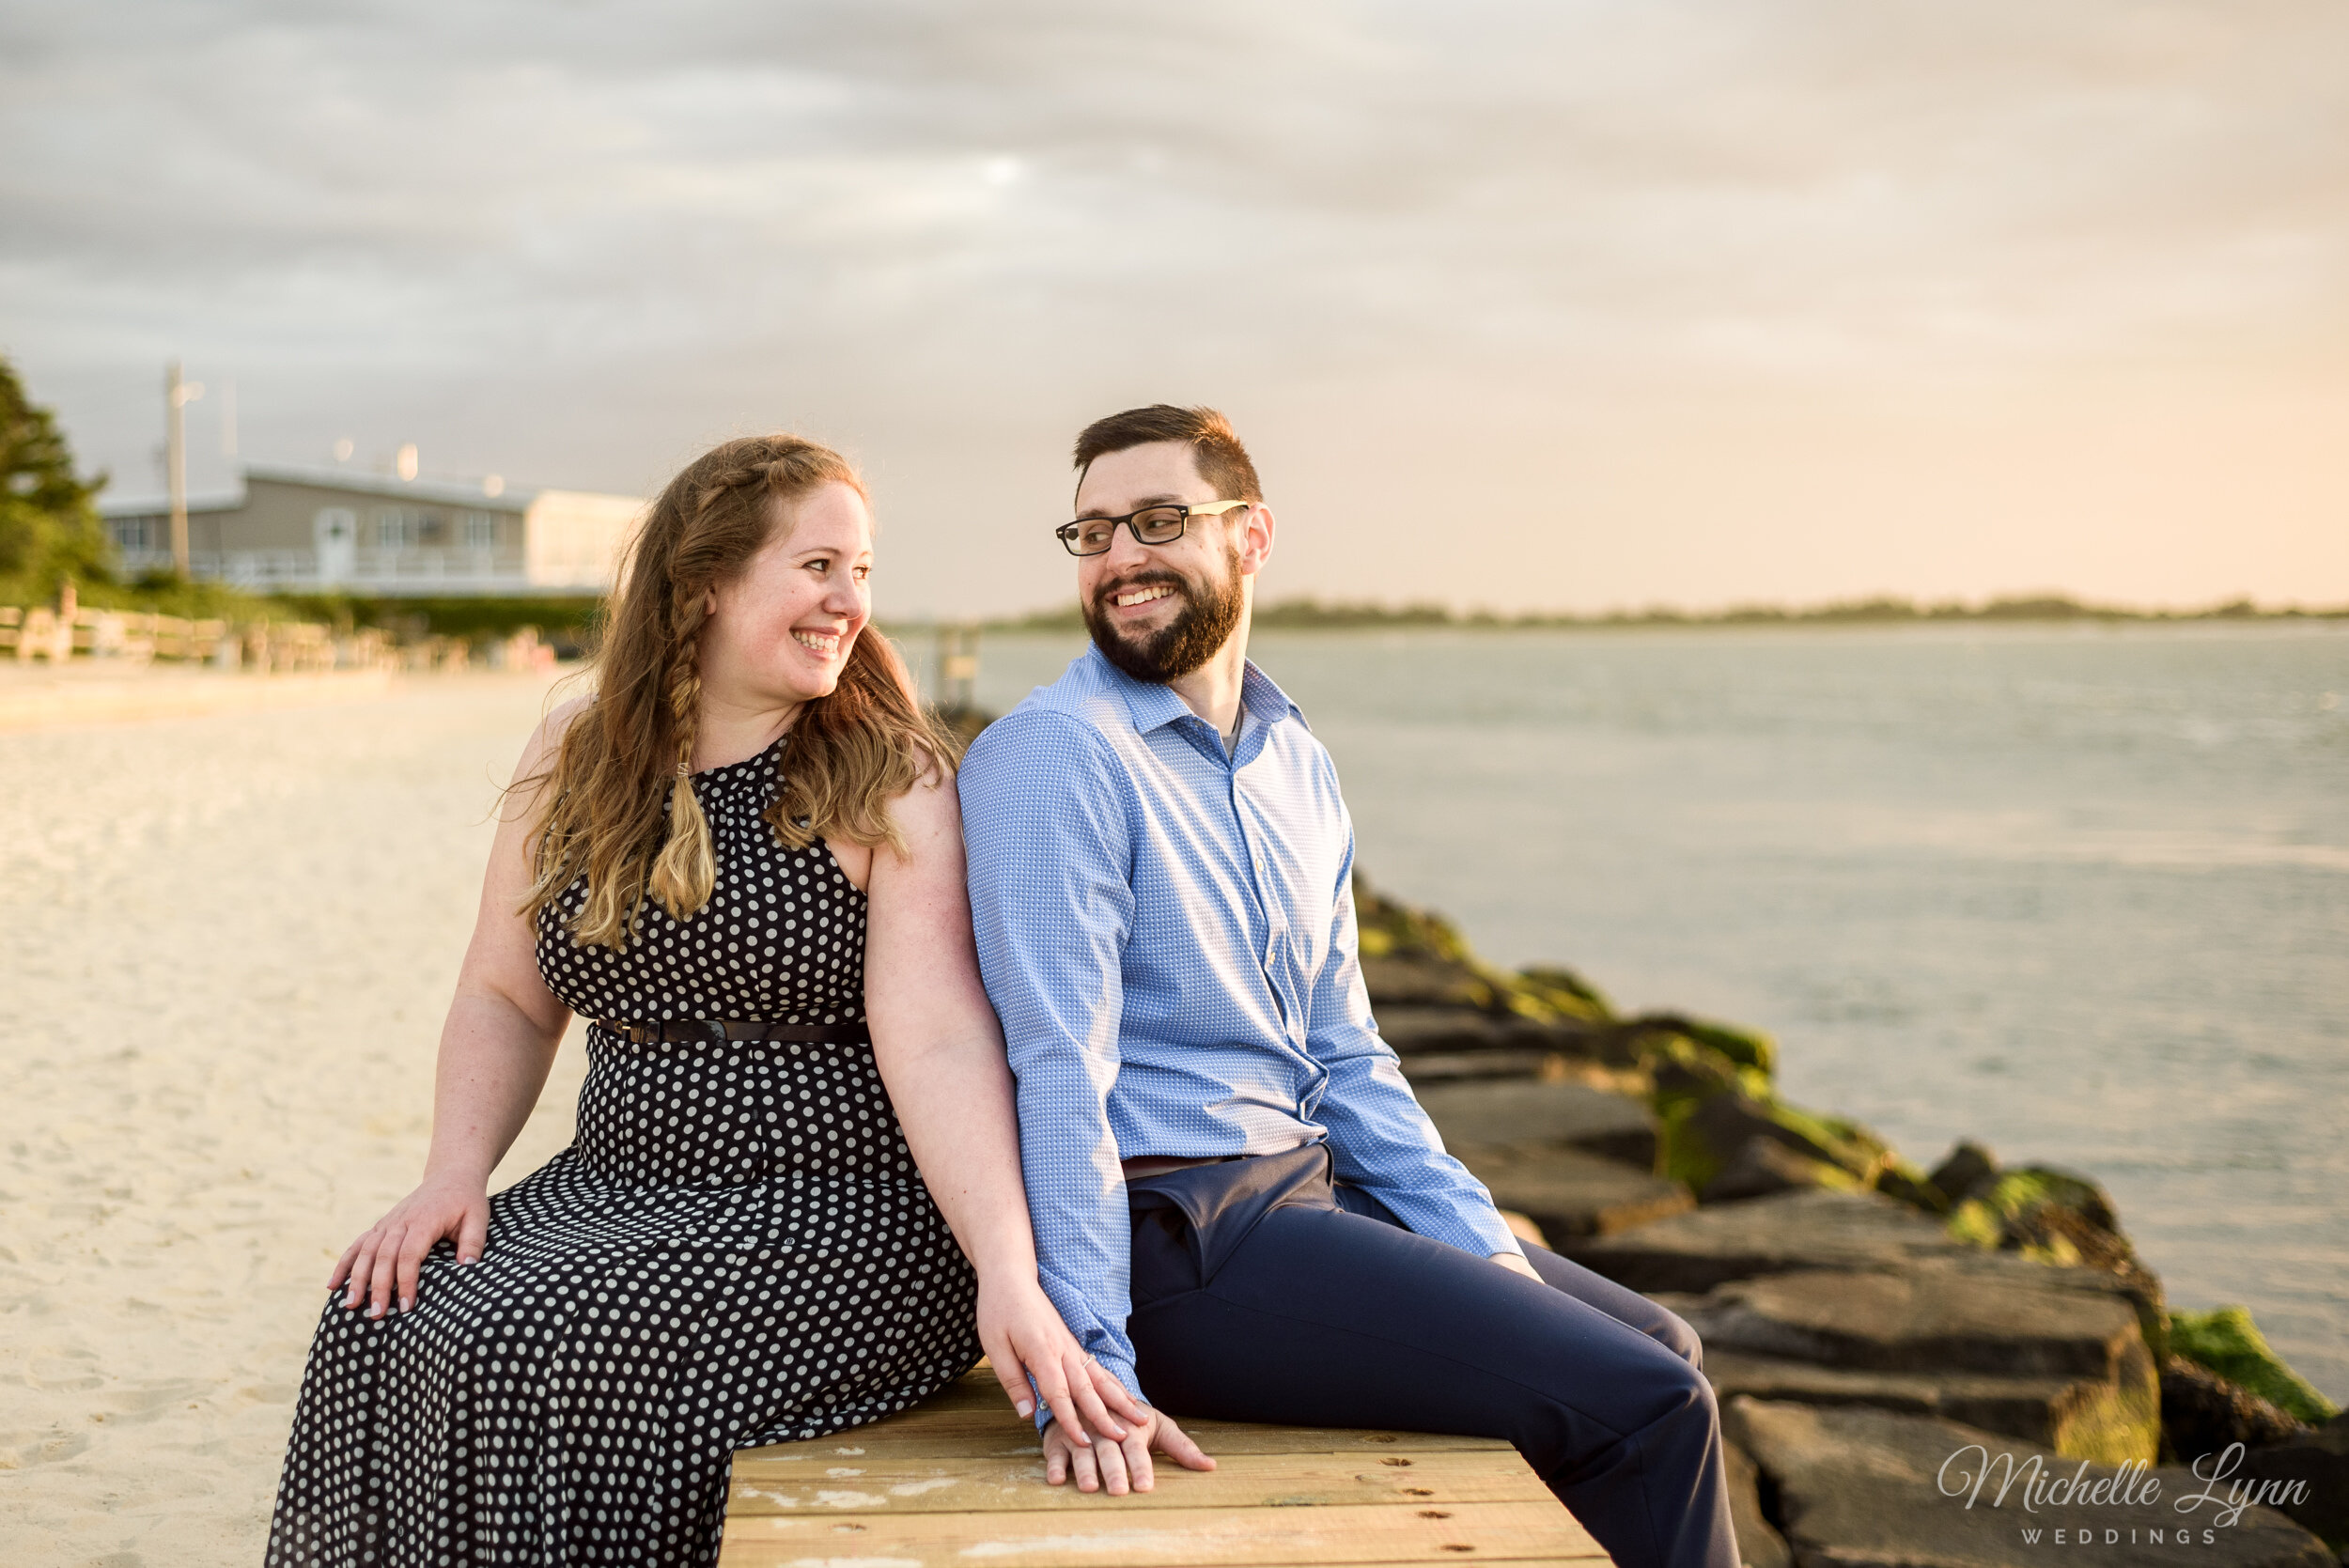 barnegat-lighthouse-engagement-photos-michelle-lynn-weddings-22.jpg